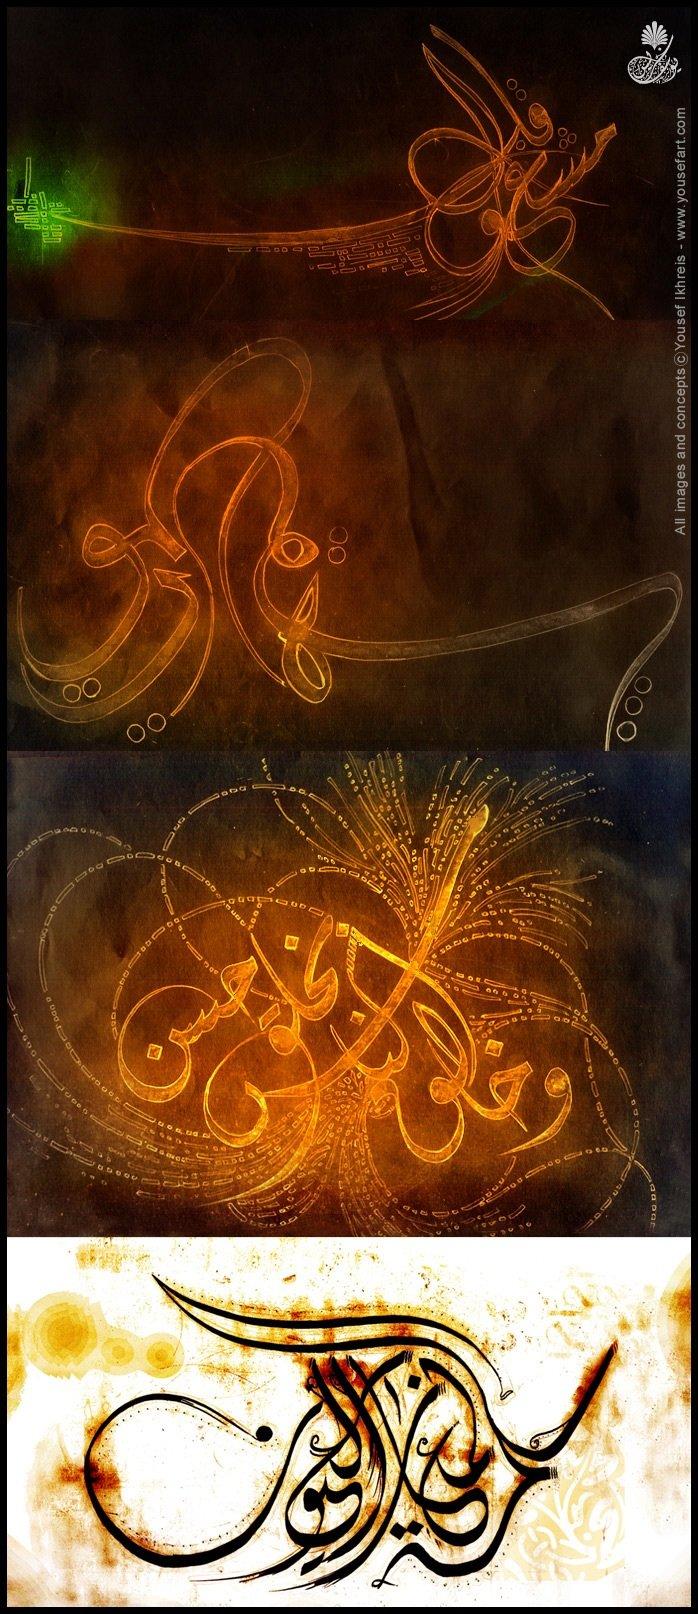 Arabic Calligraphy Art work